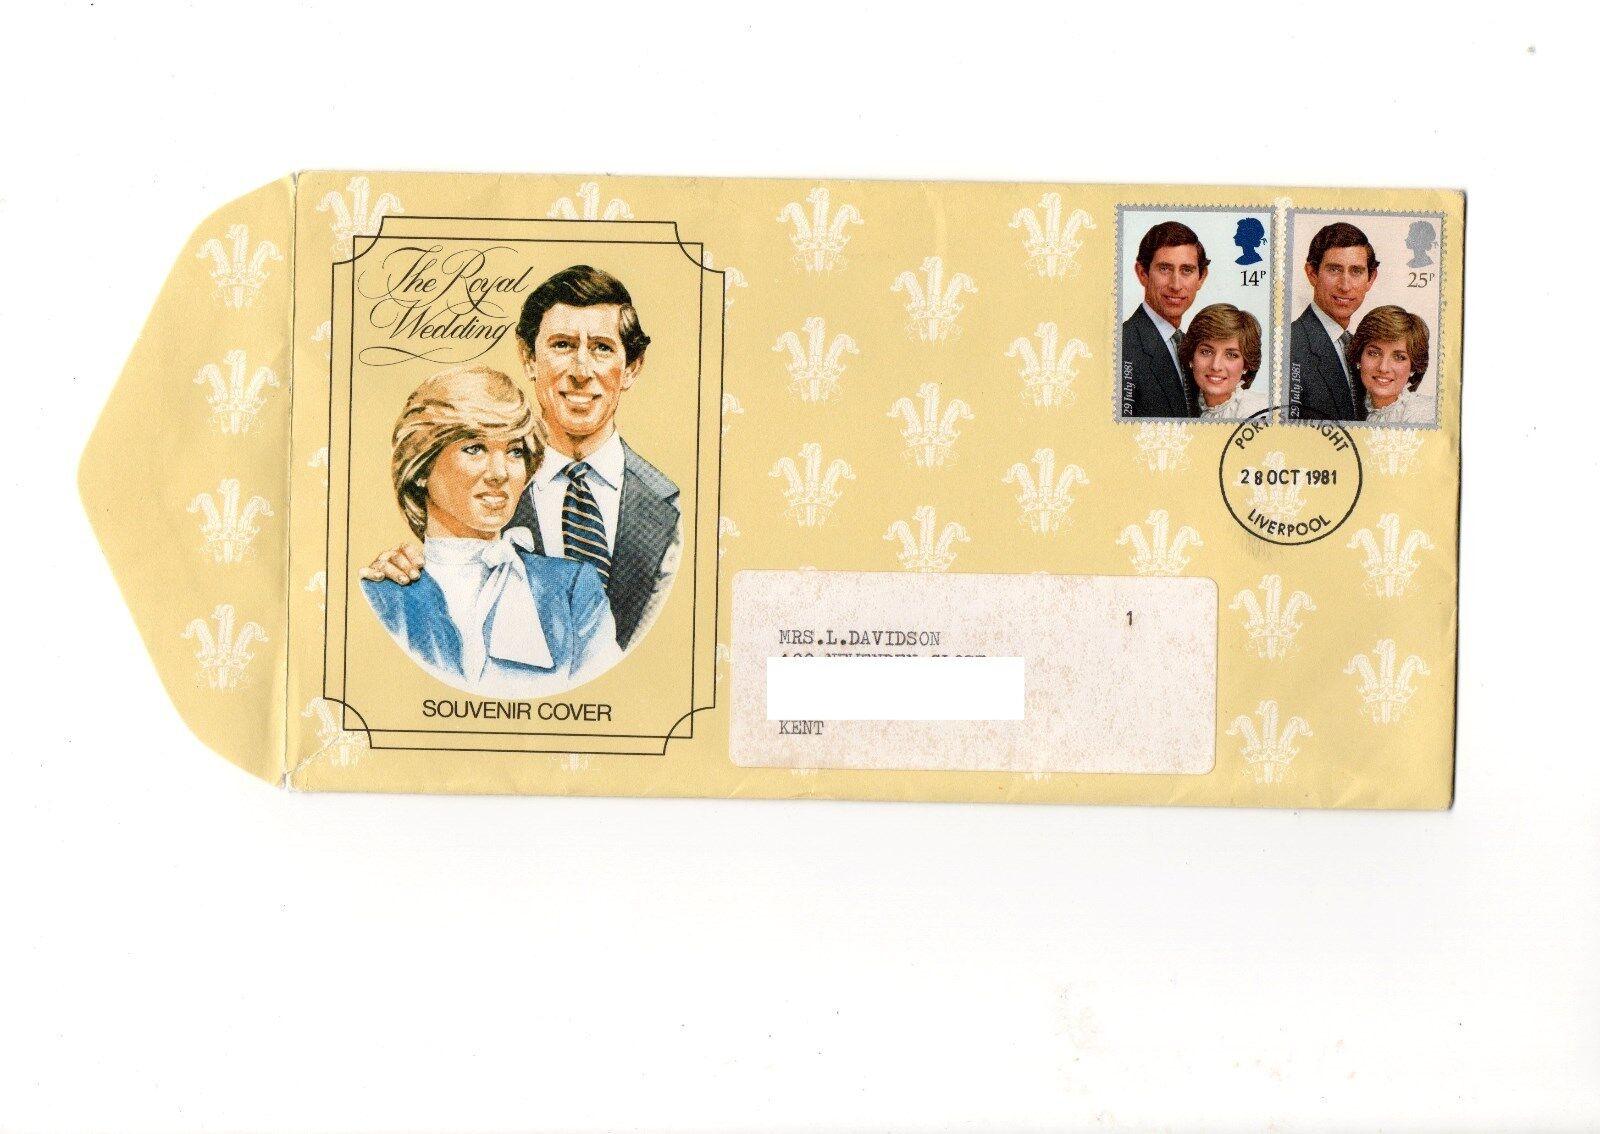 GB - 1981 Royal Wedding Souvenir Cover Port Sunlight dated 28th Oct 1981